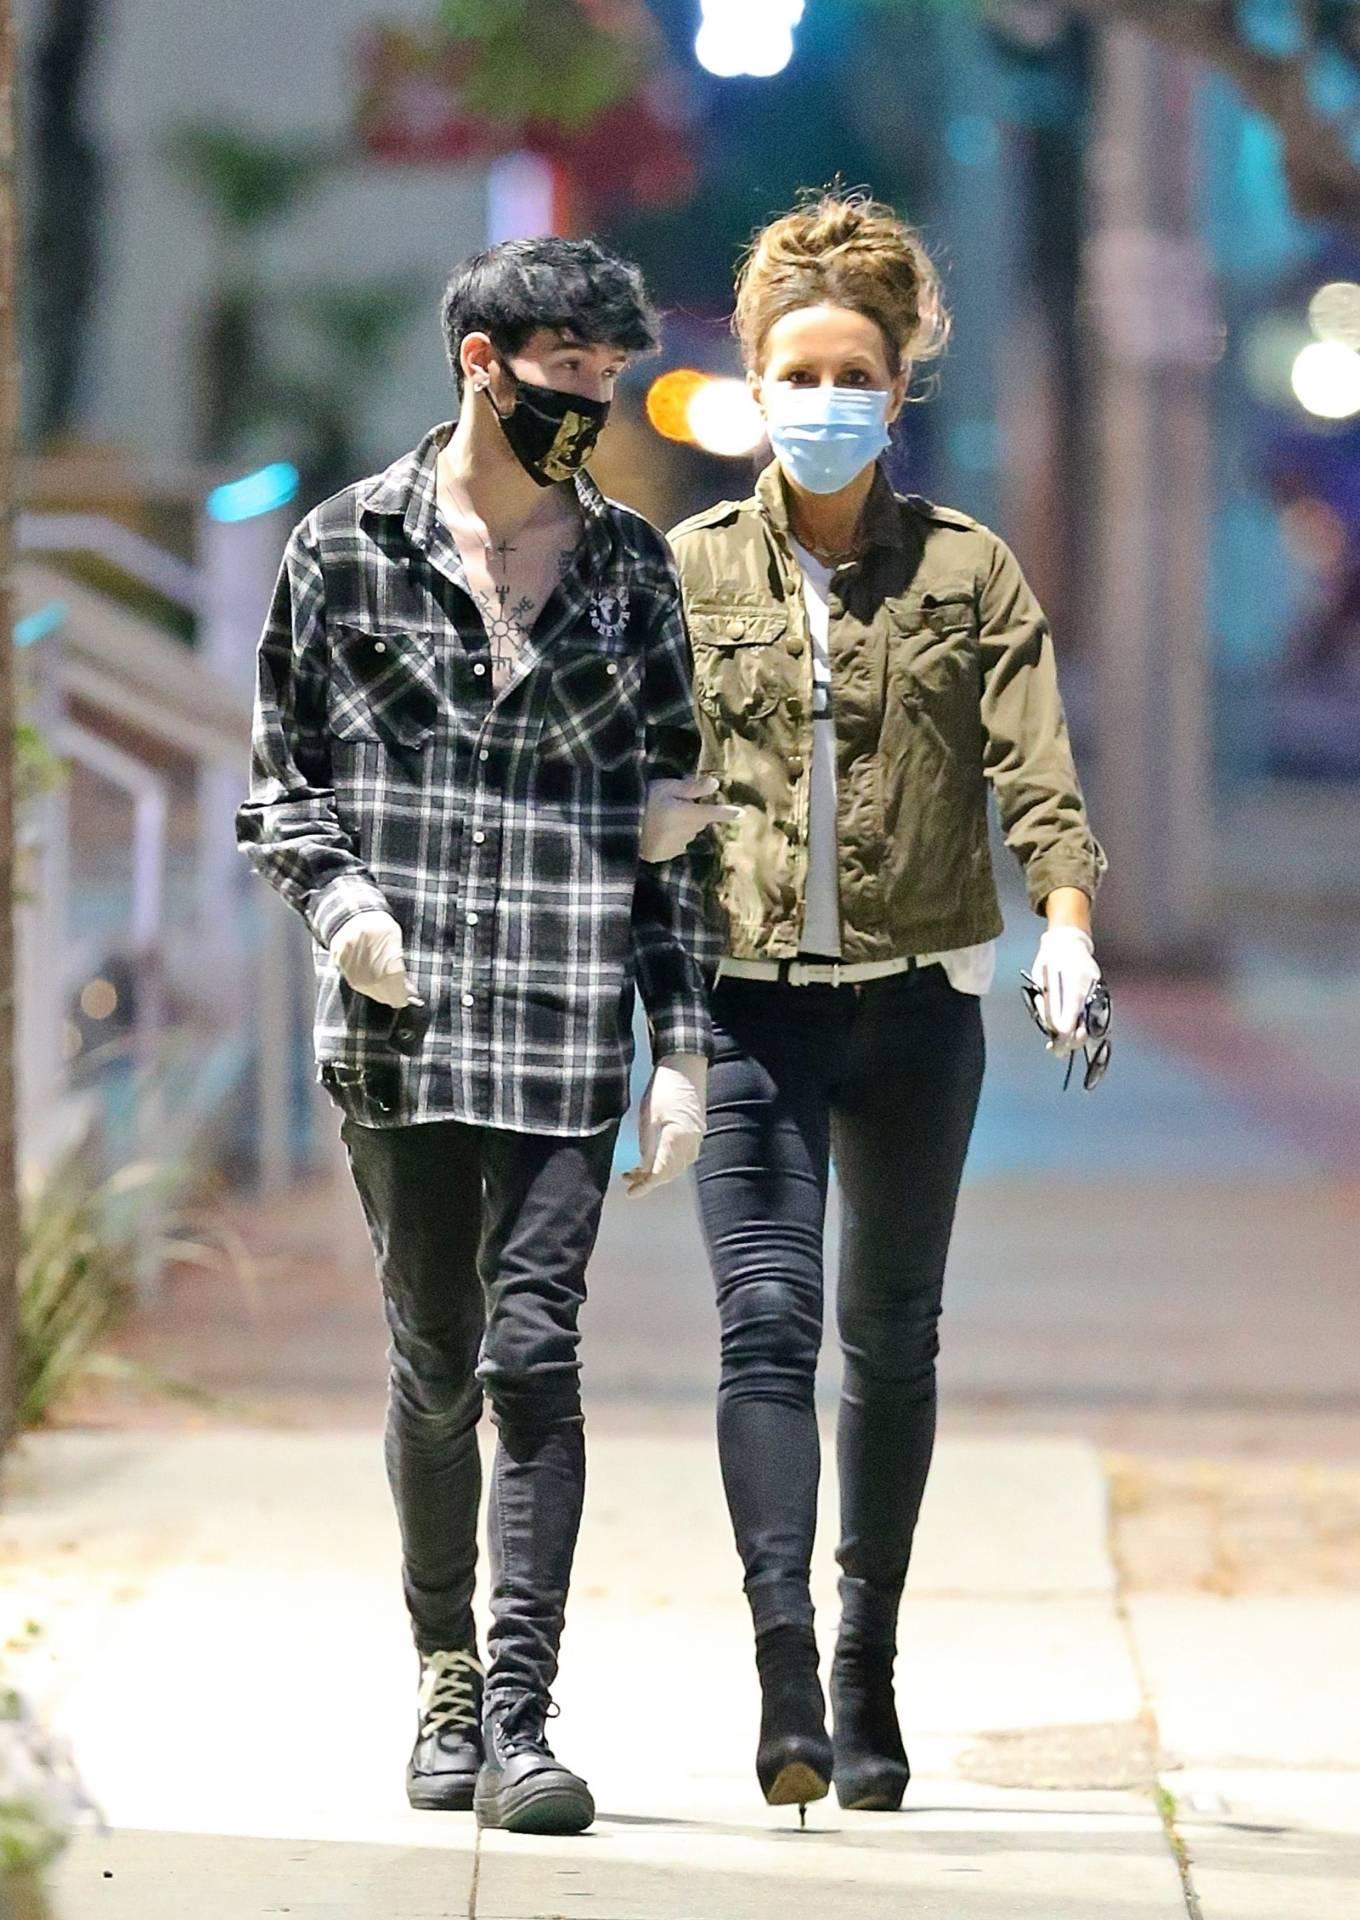 Kate Beckinsale seen with her boyfriend in Los Angeles